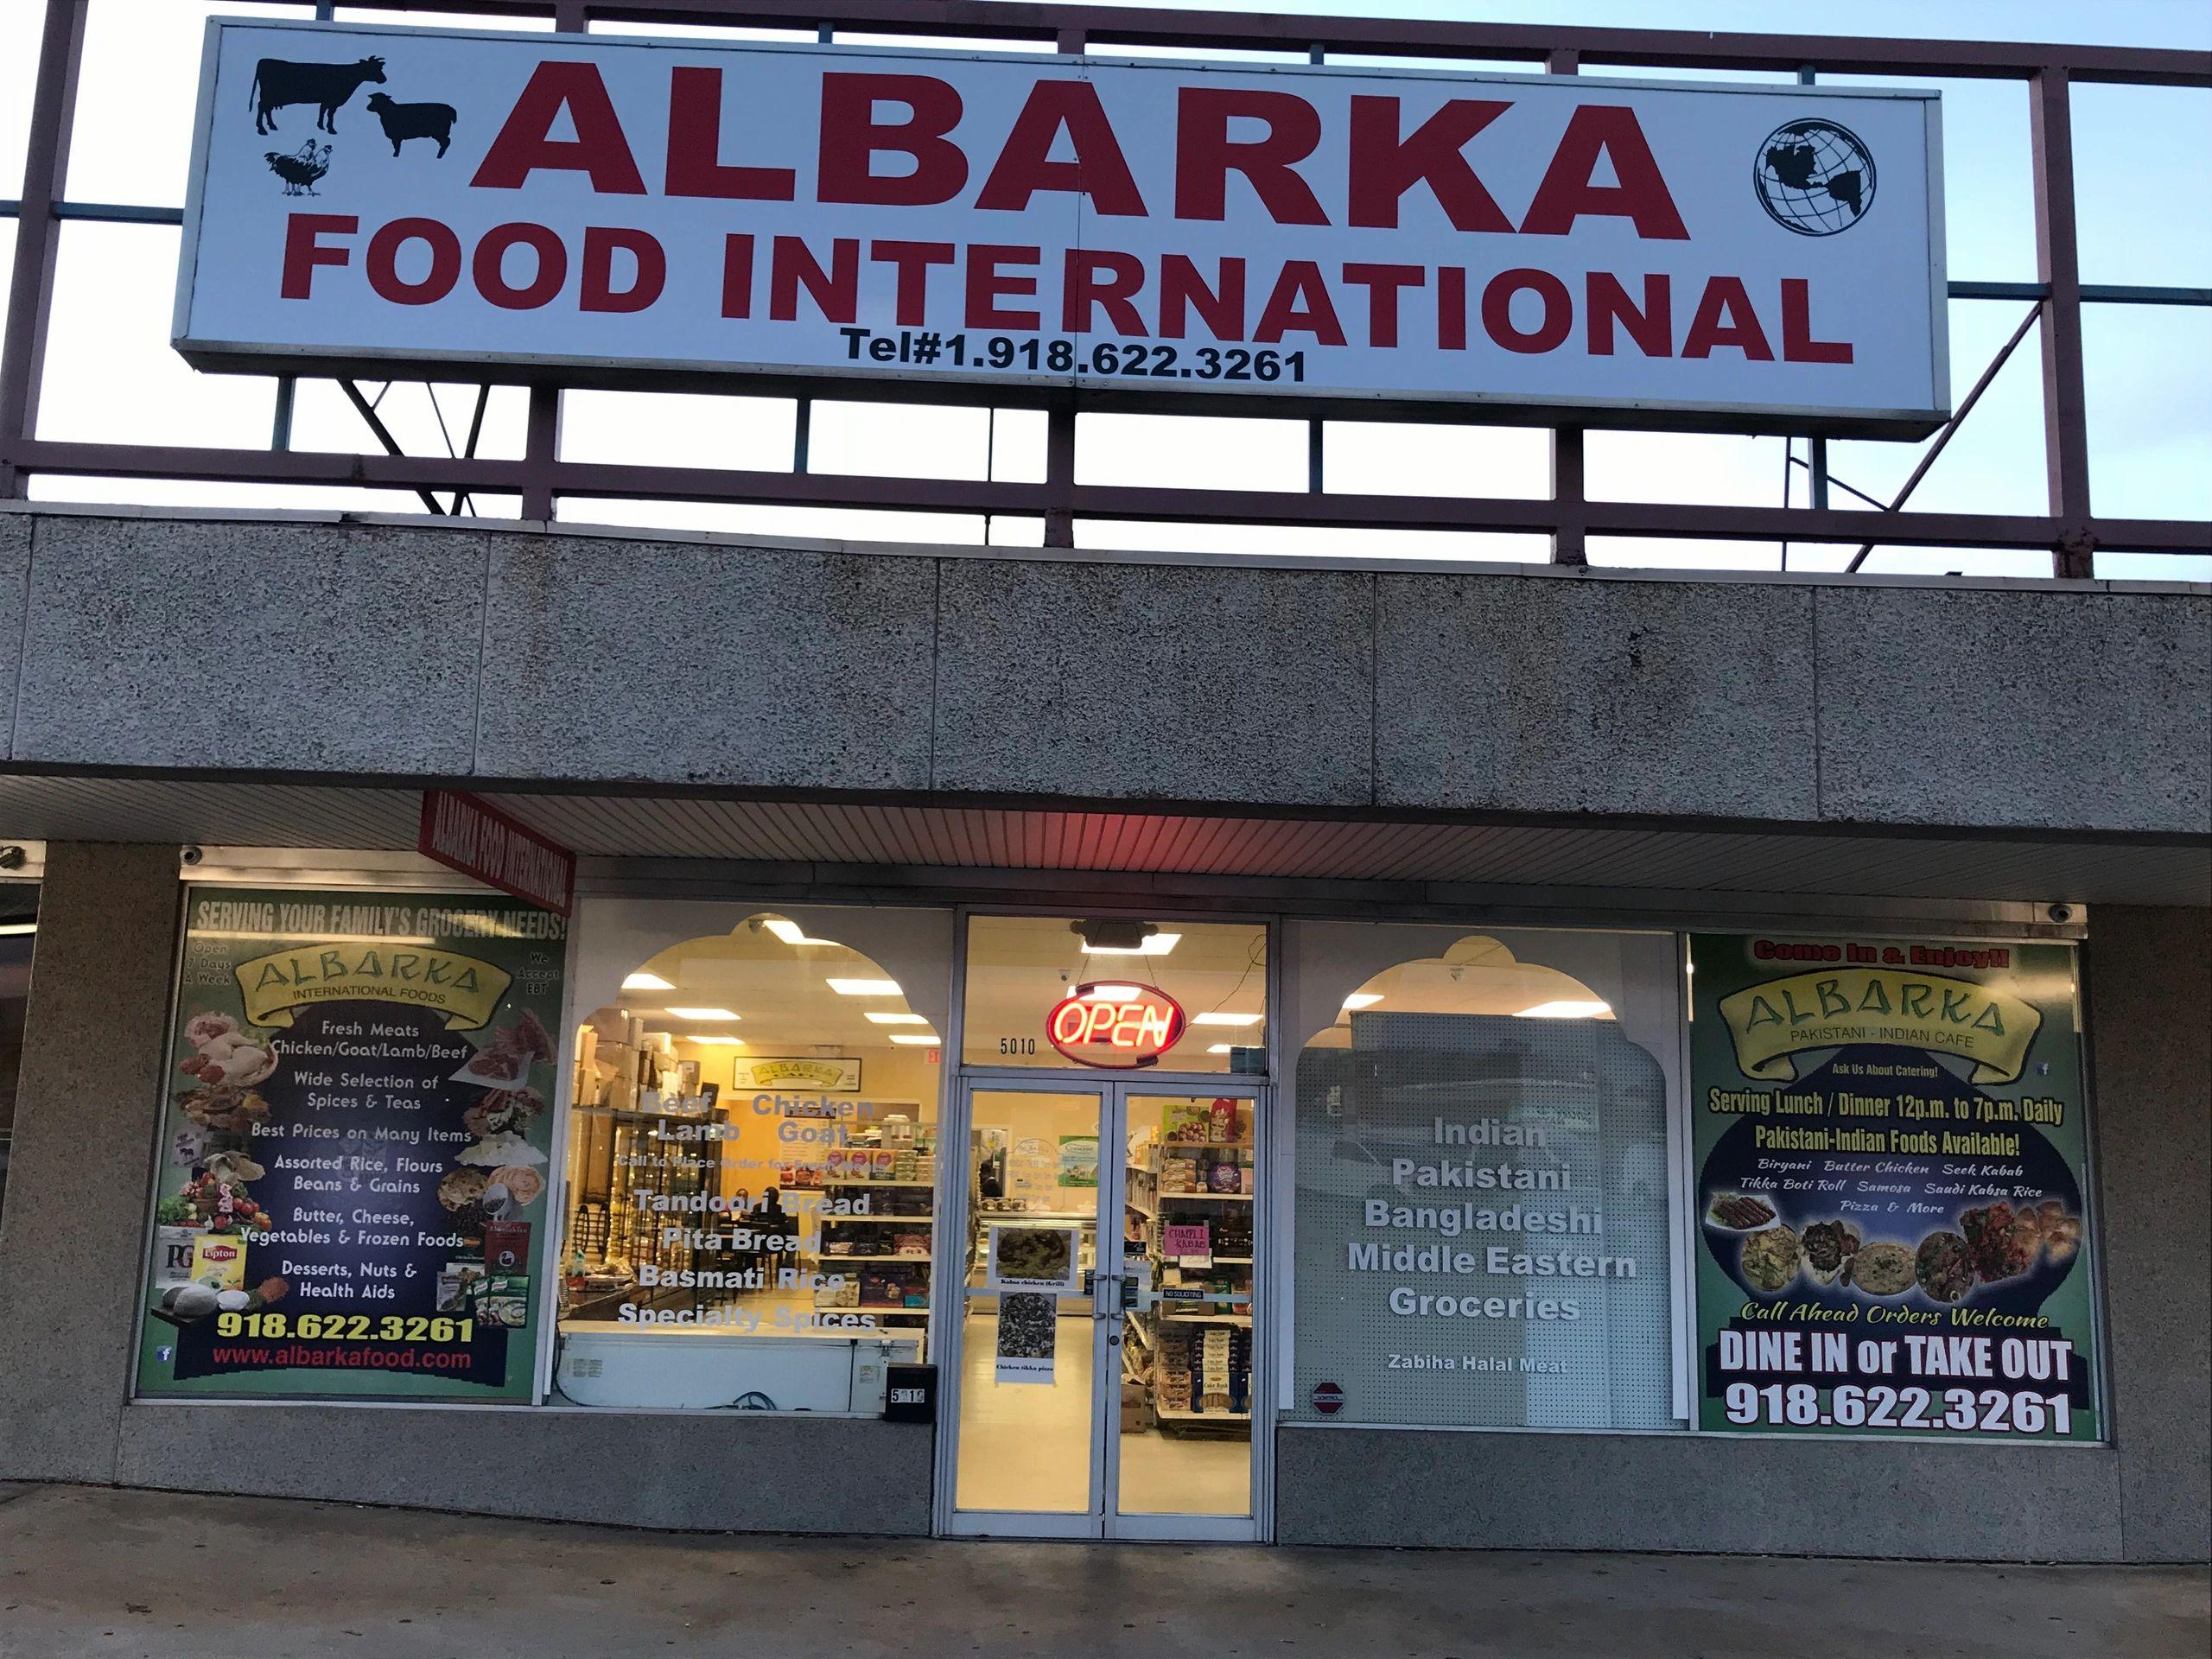 Albarkafood com - Indian / Pakistani Grocery, Halal Meat